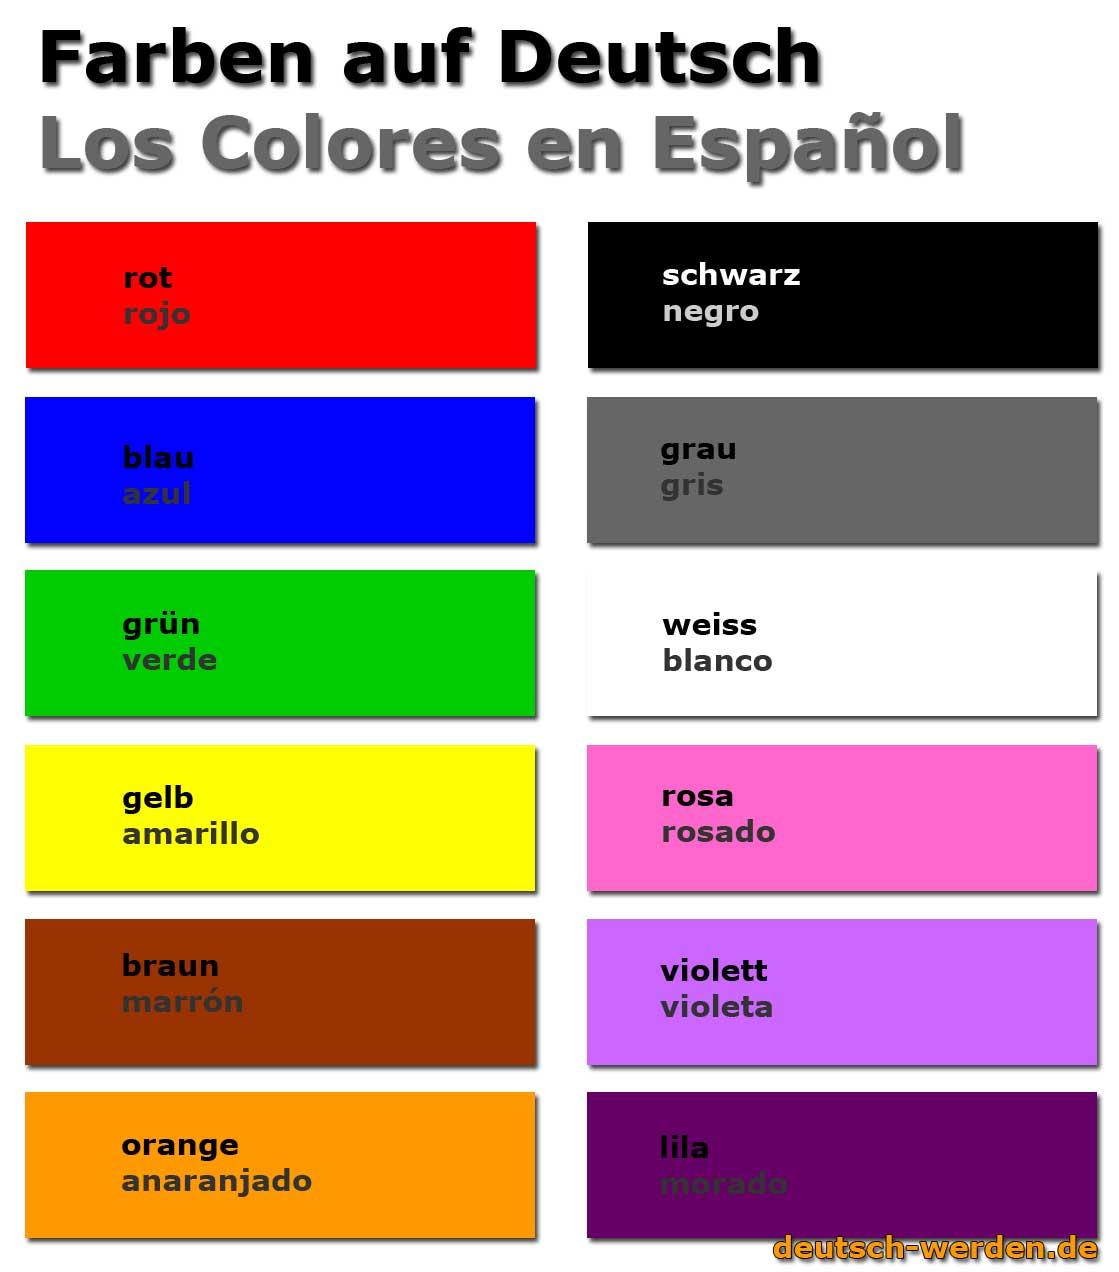 farben auf deutsch und spanisch los colores en alem225n y